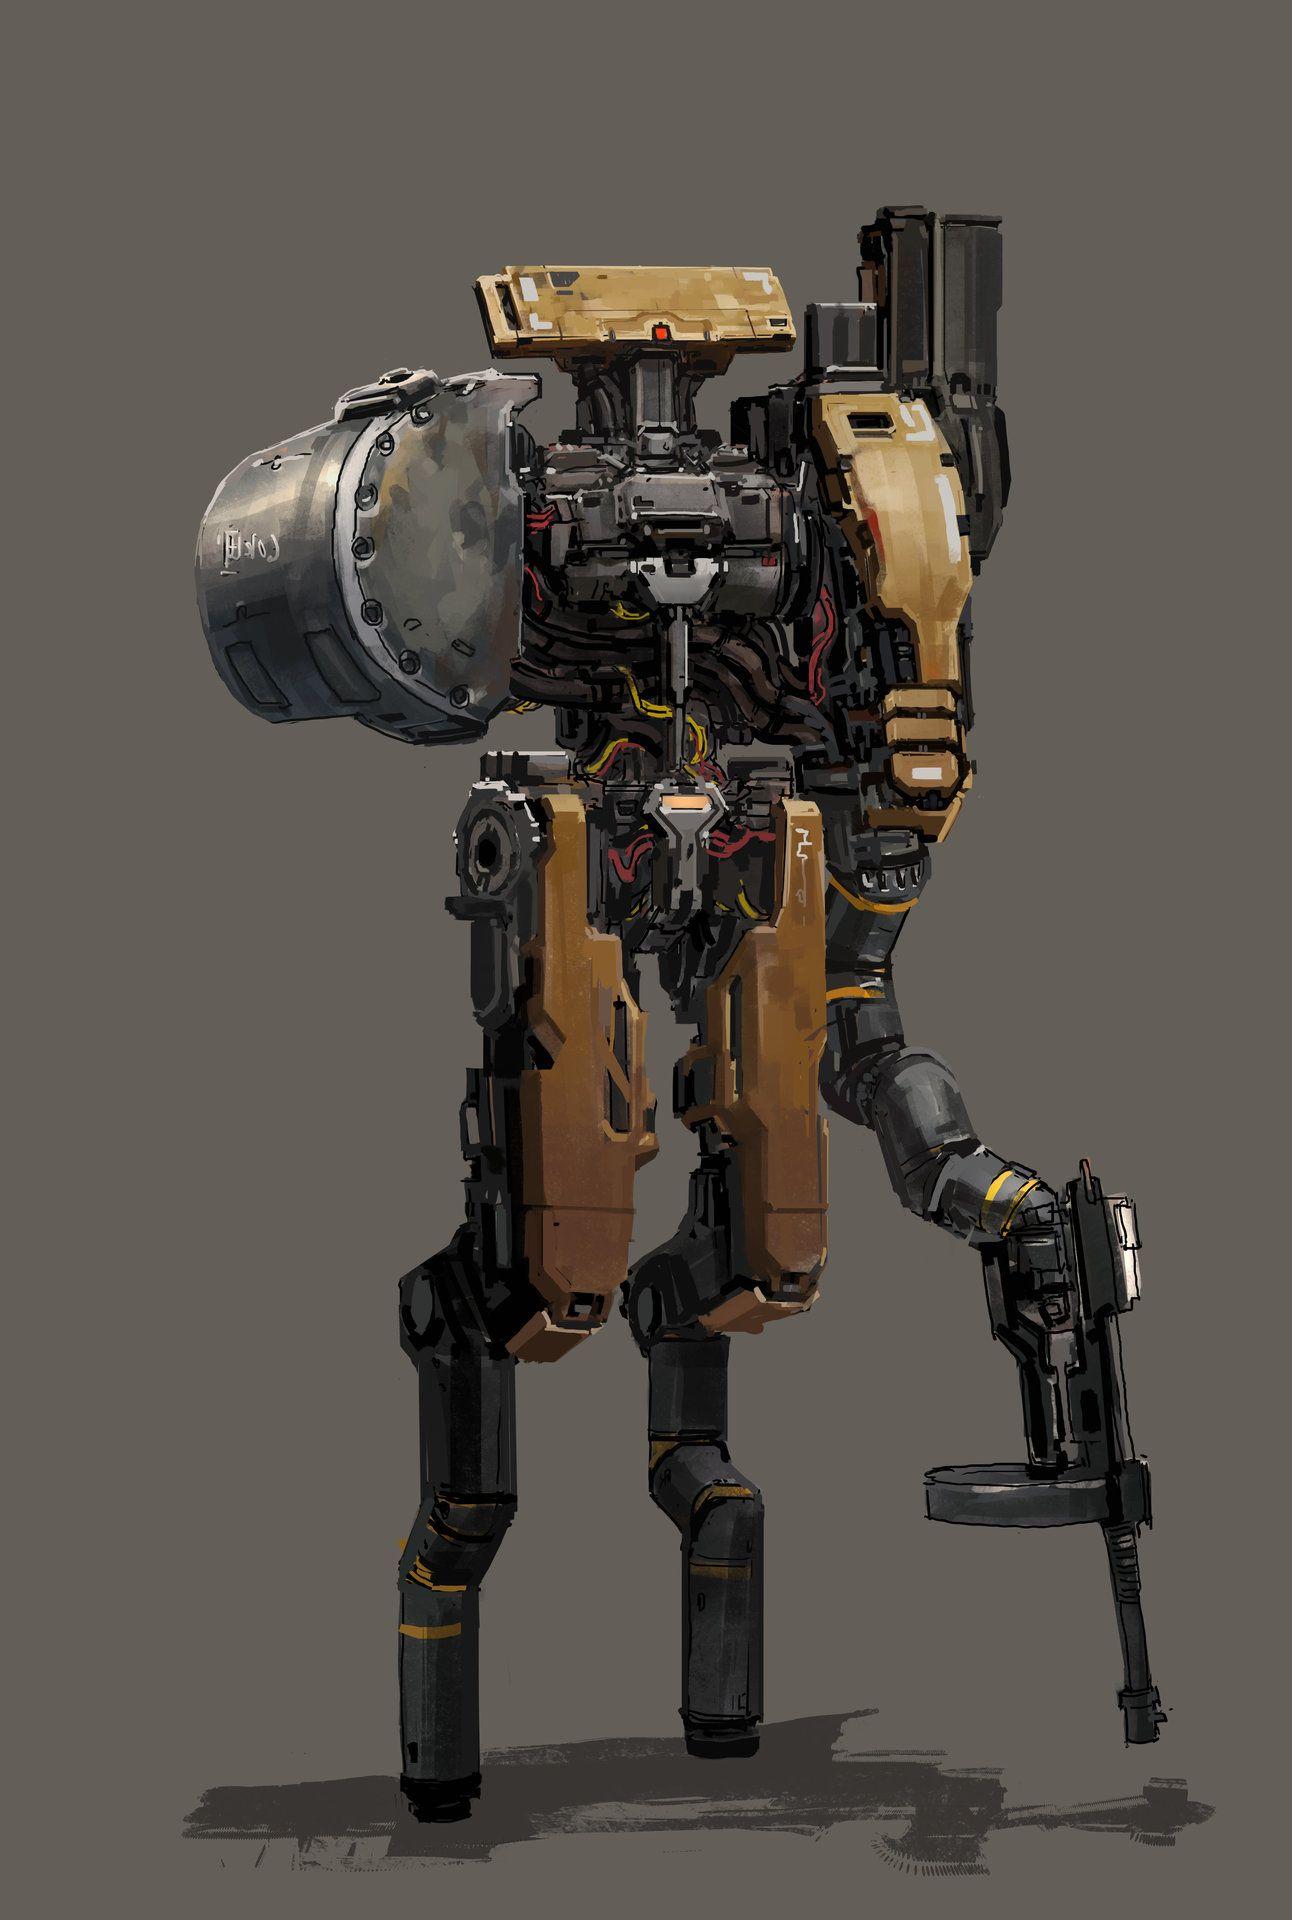 Artstation One Armed Bandit Yong Yi Lee Sci Fi Pinterest Robotics Prometheus Pcb Maker Automates Circuit Board Creation Video Robot Art Concept